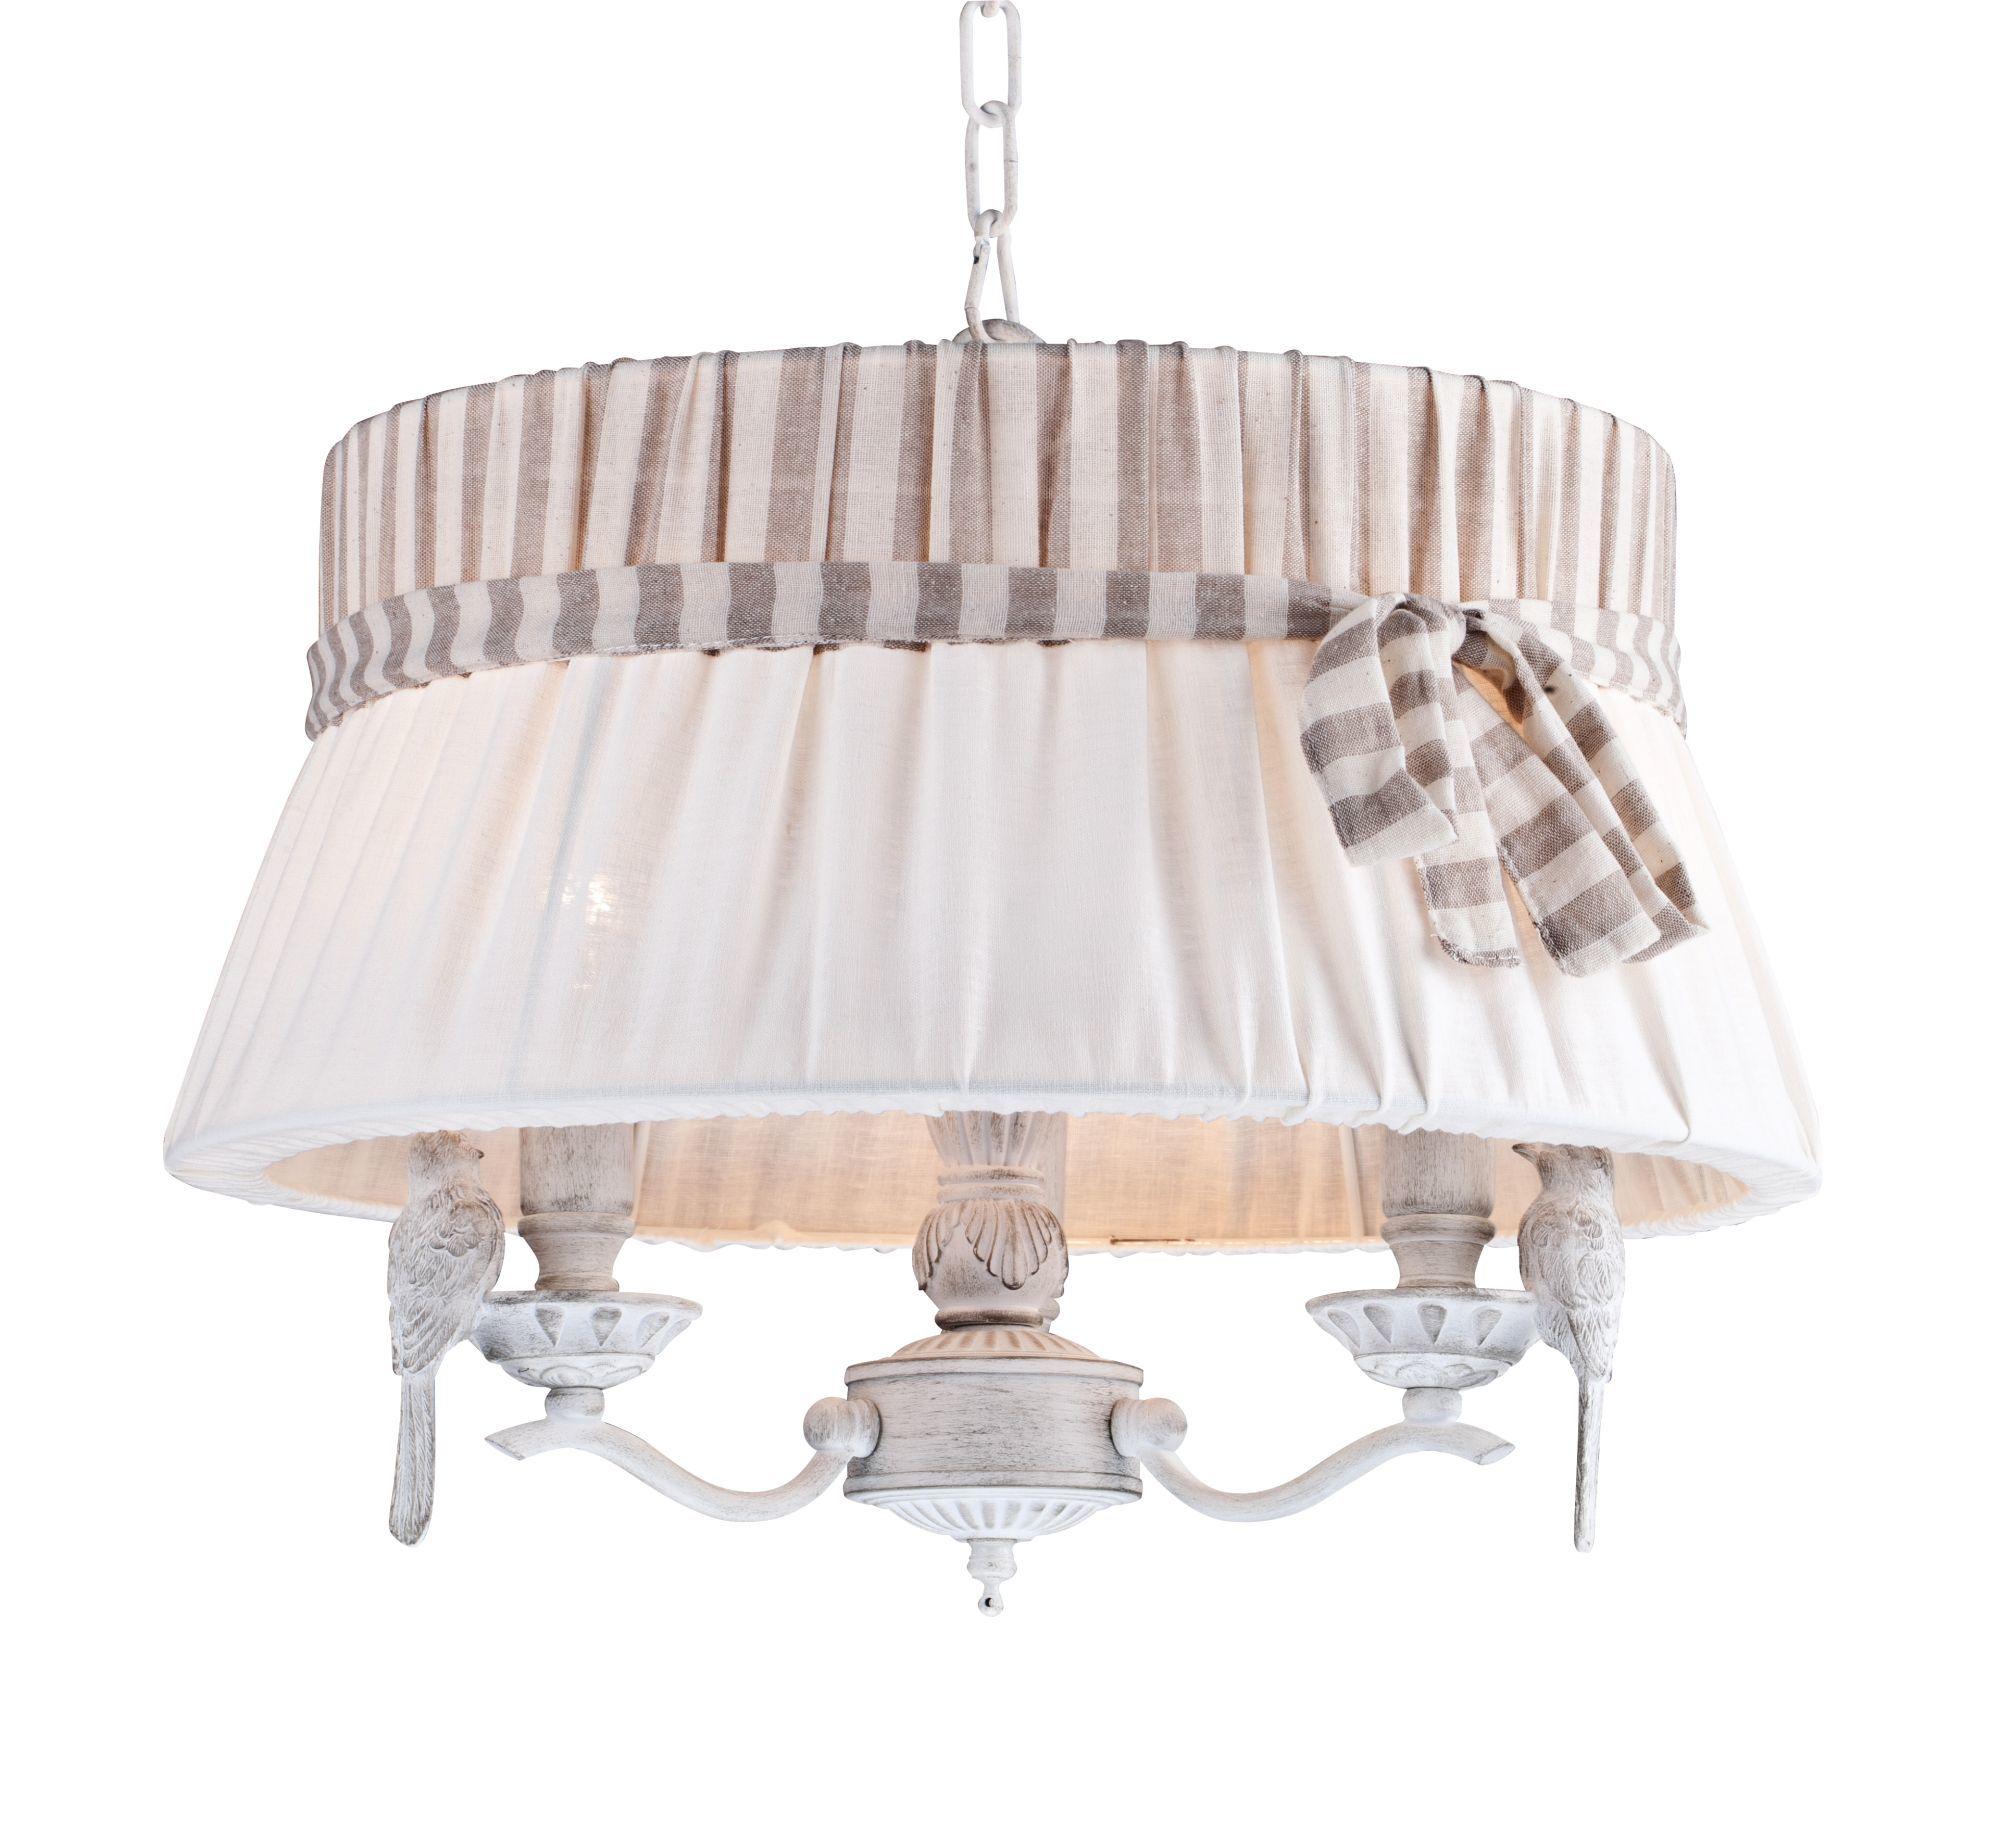 Подвесная люстра Maytoni Bird ARM013-33-W, 3xE14x40W, белый, бежевый, серый, металл, пластик, текстиль - фото 2